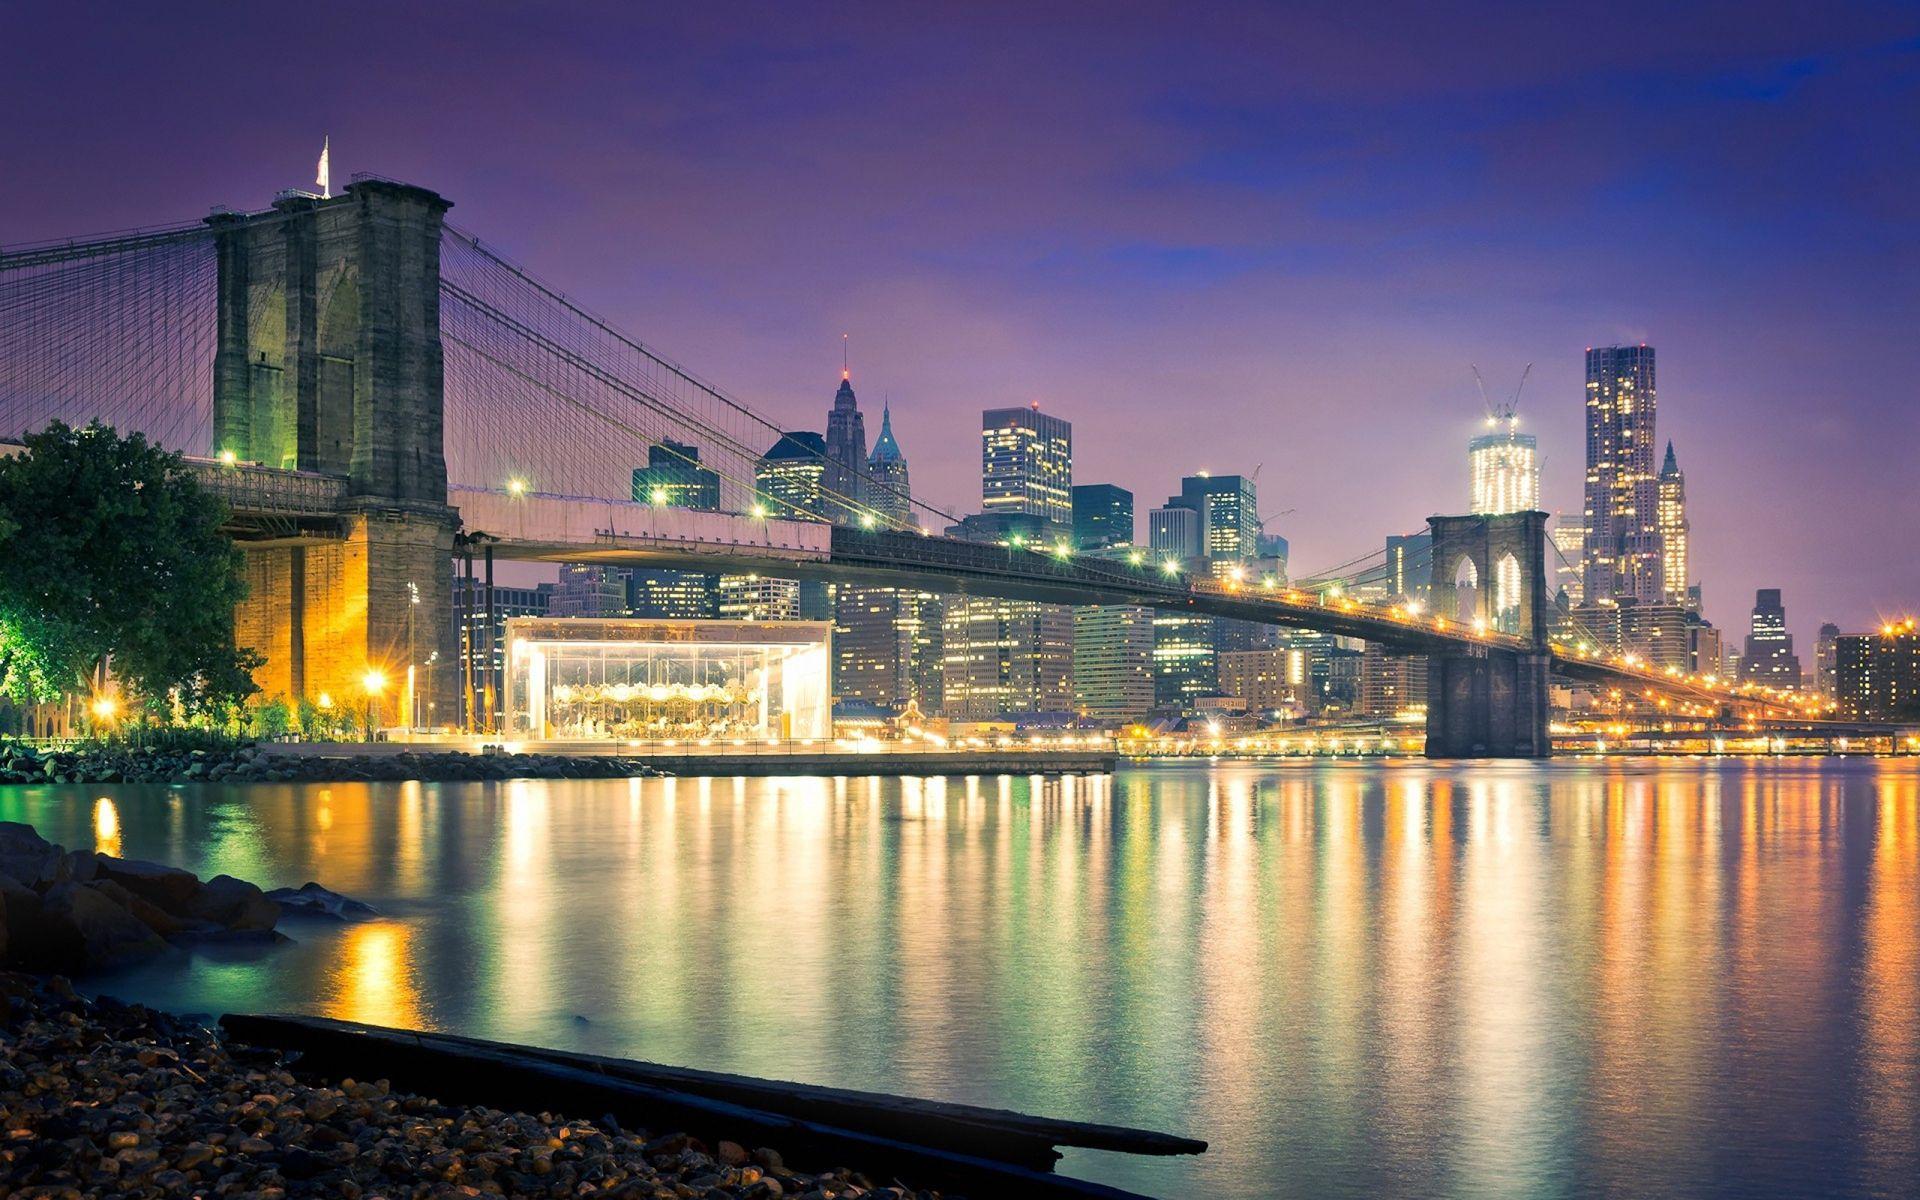 Most Inspiring Wallpaper Night Brooklyn Bridge - f8409406881a6b5692e4901055ebae30  Snapshot.jpg